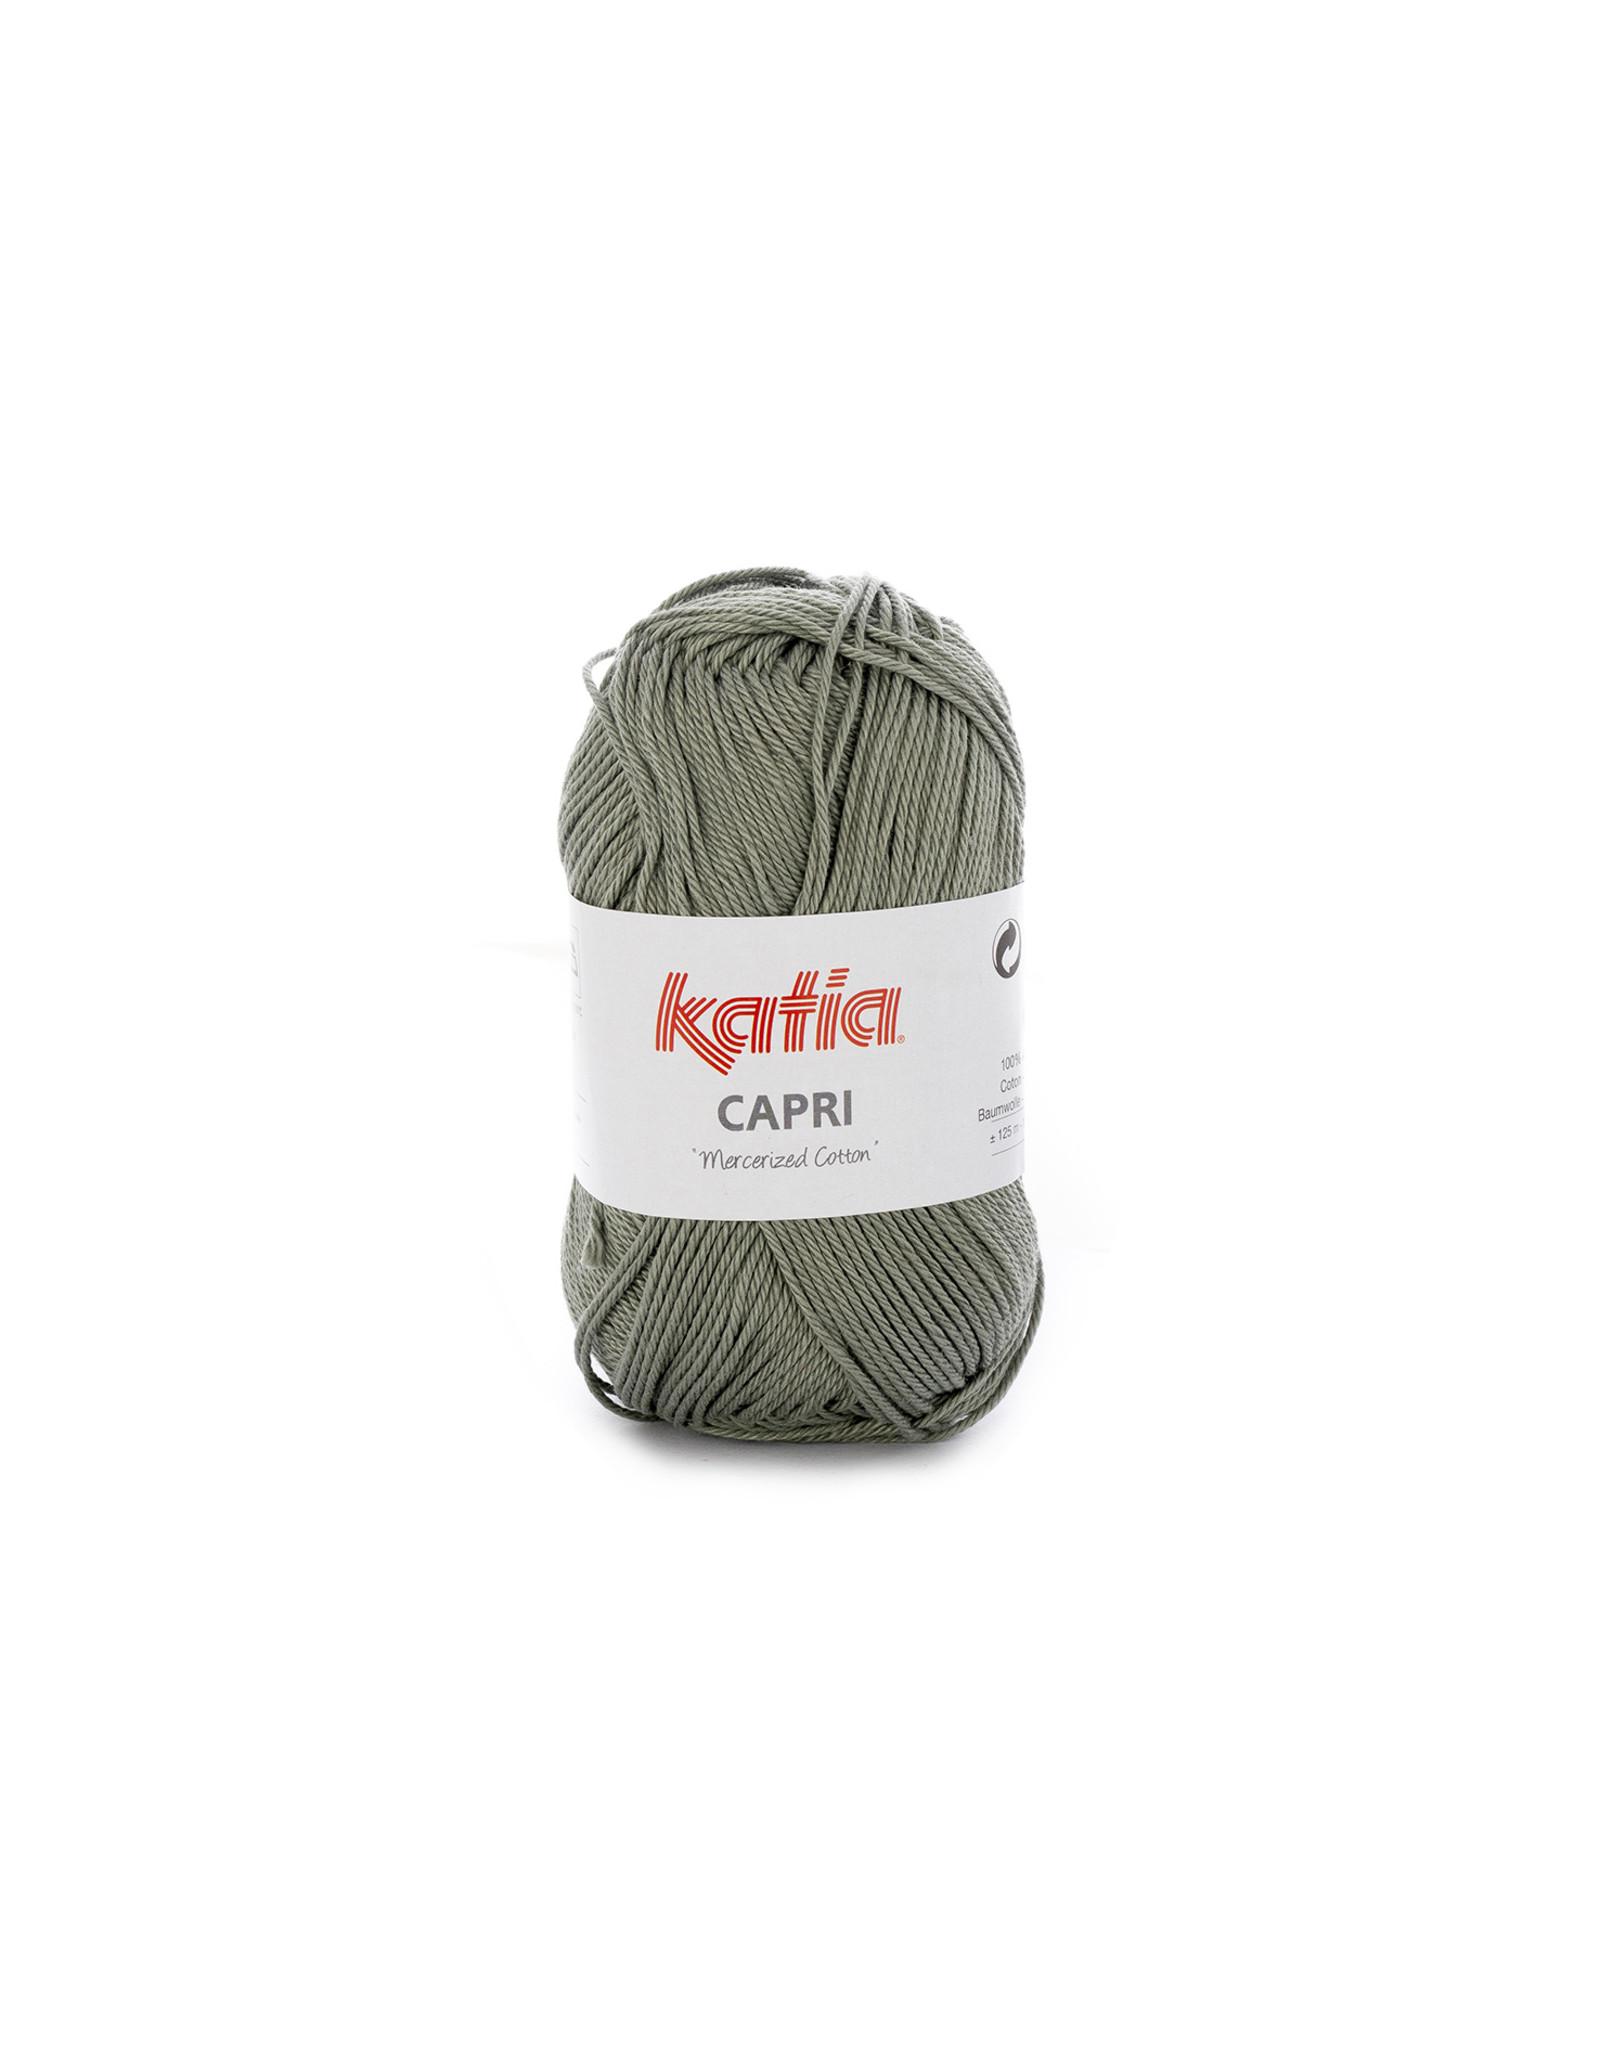 Katia Katia Capri - kleur 137 Medium groen - 50 gr. = 125 m. - 100% katoen